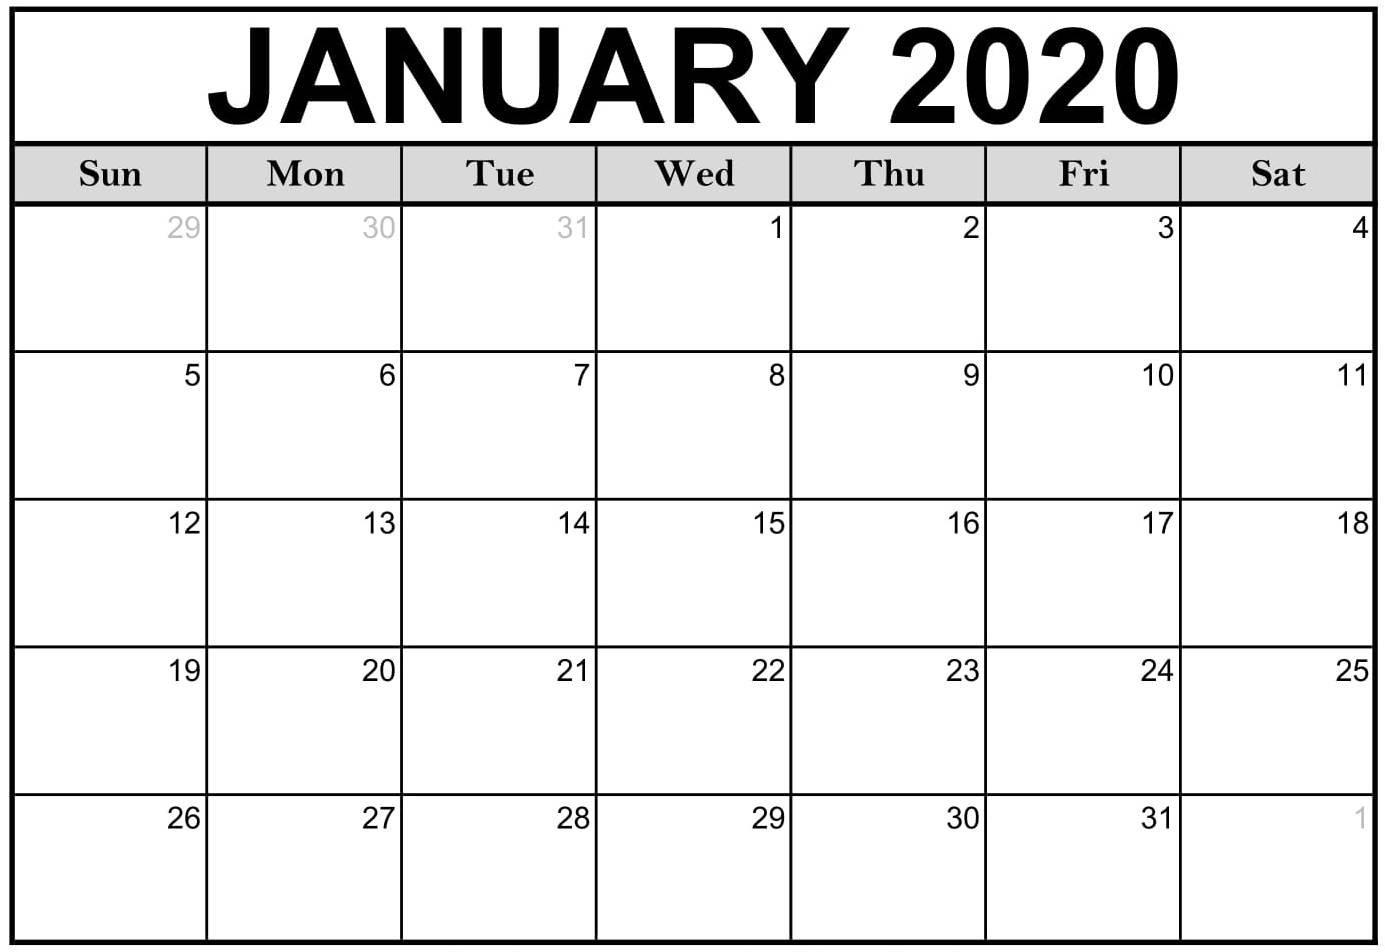 2020 Calendar Fillable   Free Printable Calendar Free Calendars That I Can Edit And Print